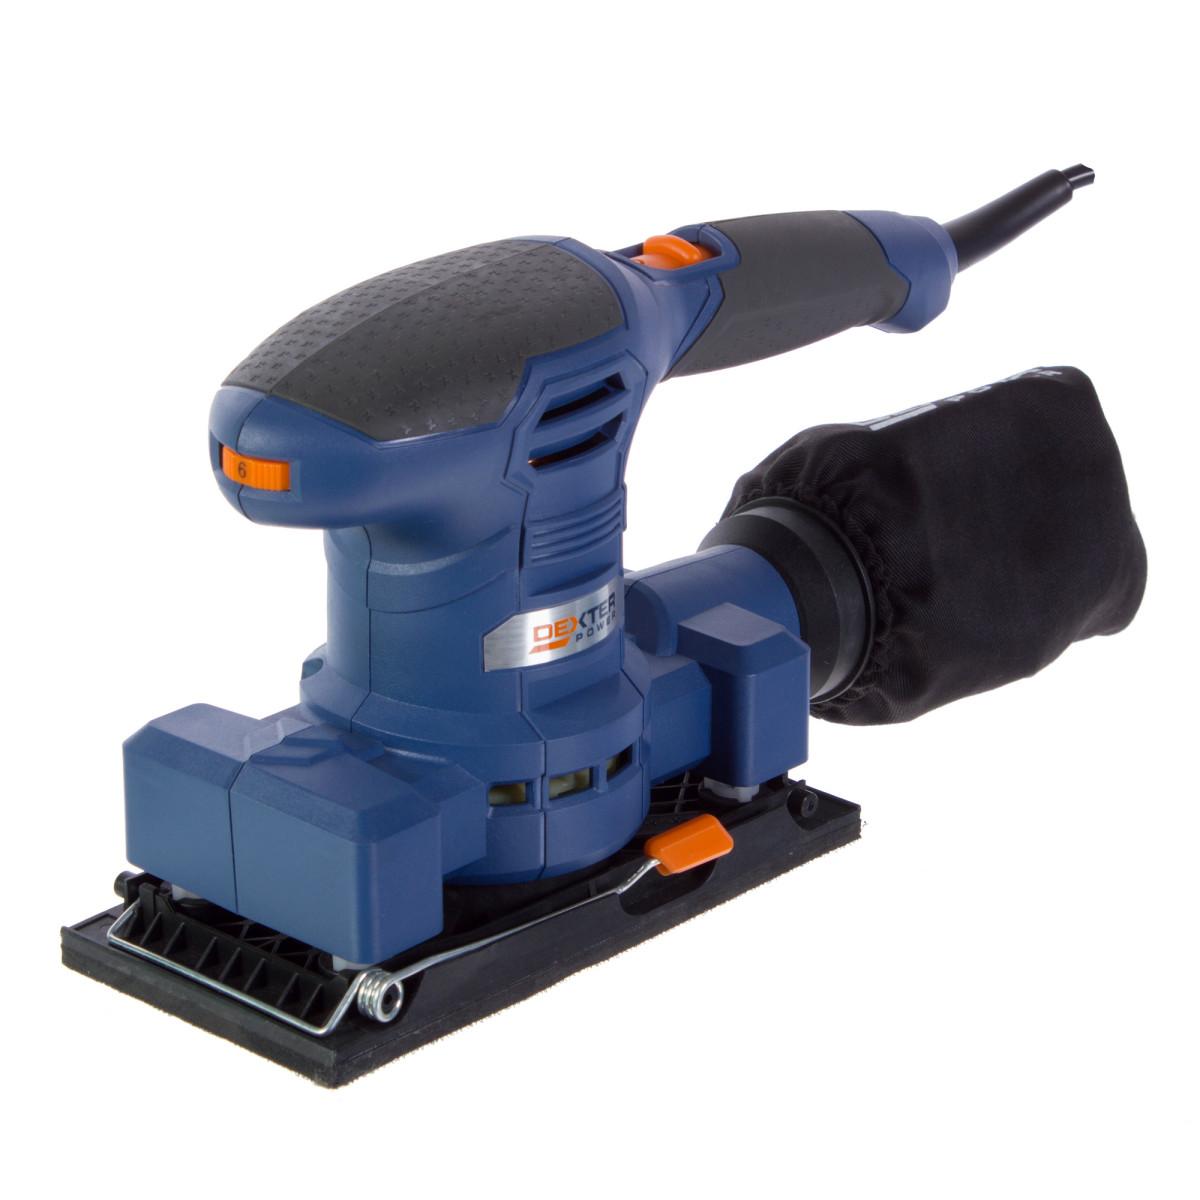 Вибрационная шлифмашина Dexter Power NC200ES 200 Вт